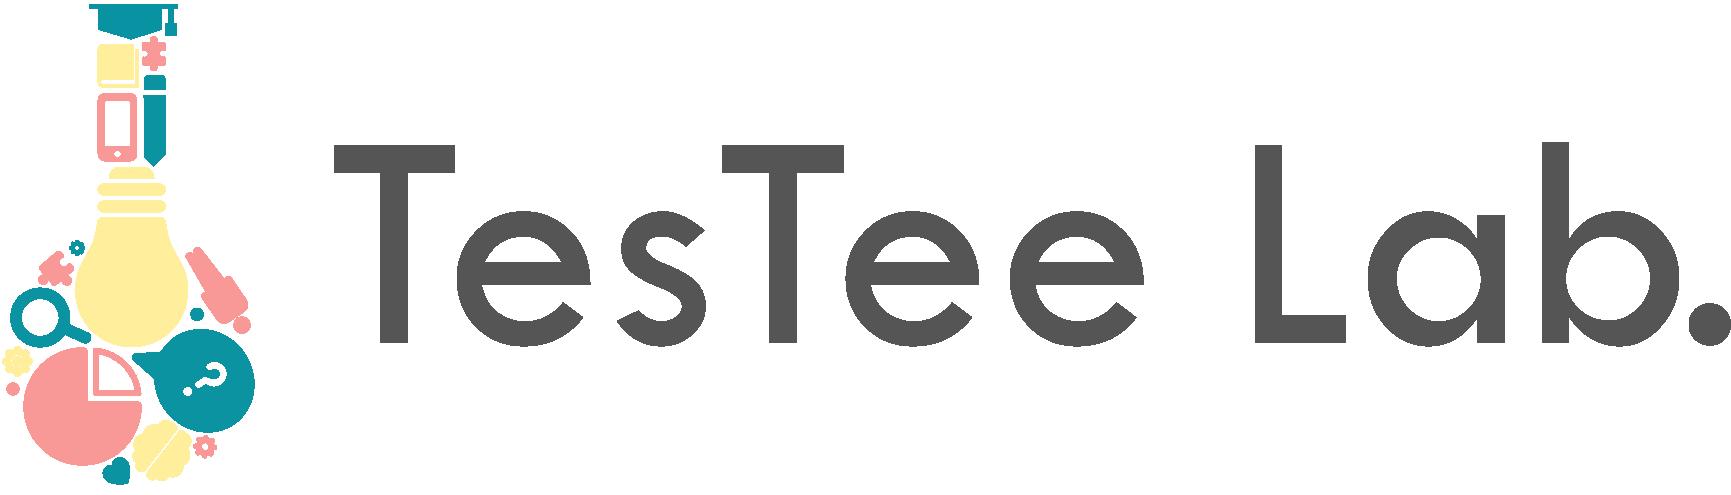 TesTee Lab(テスティーラボ)| 若年層(10代、20代)を調査するアンケートメディア